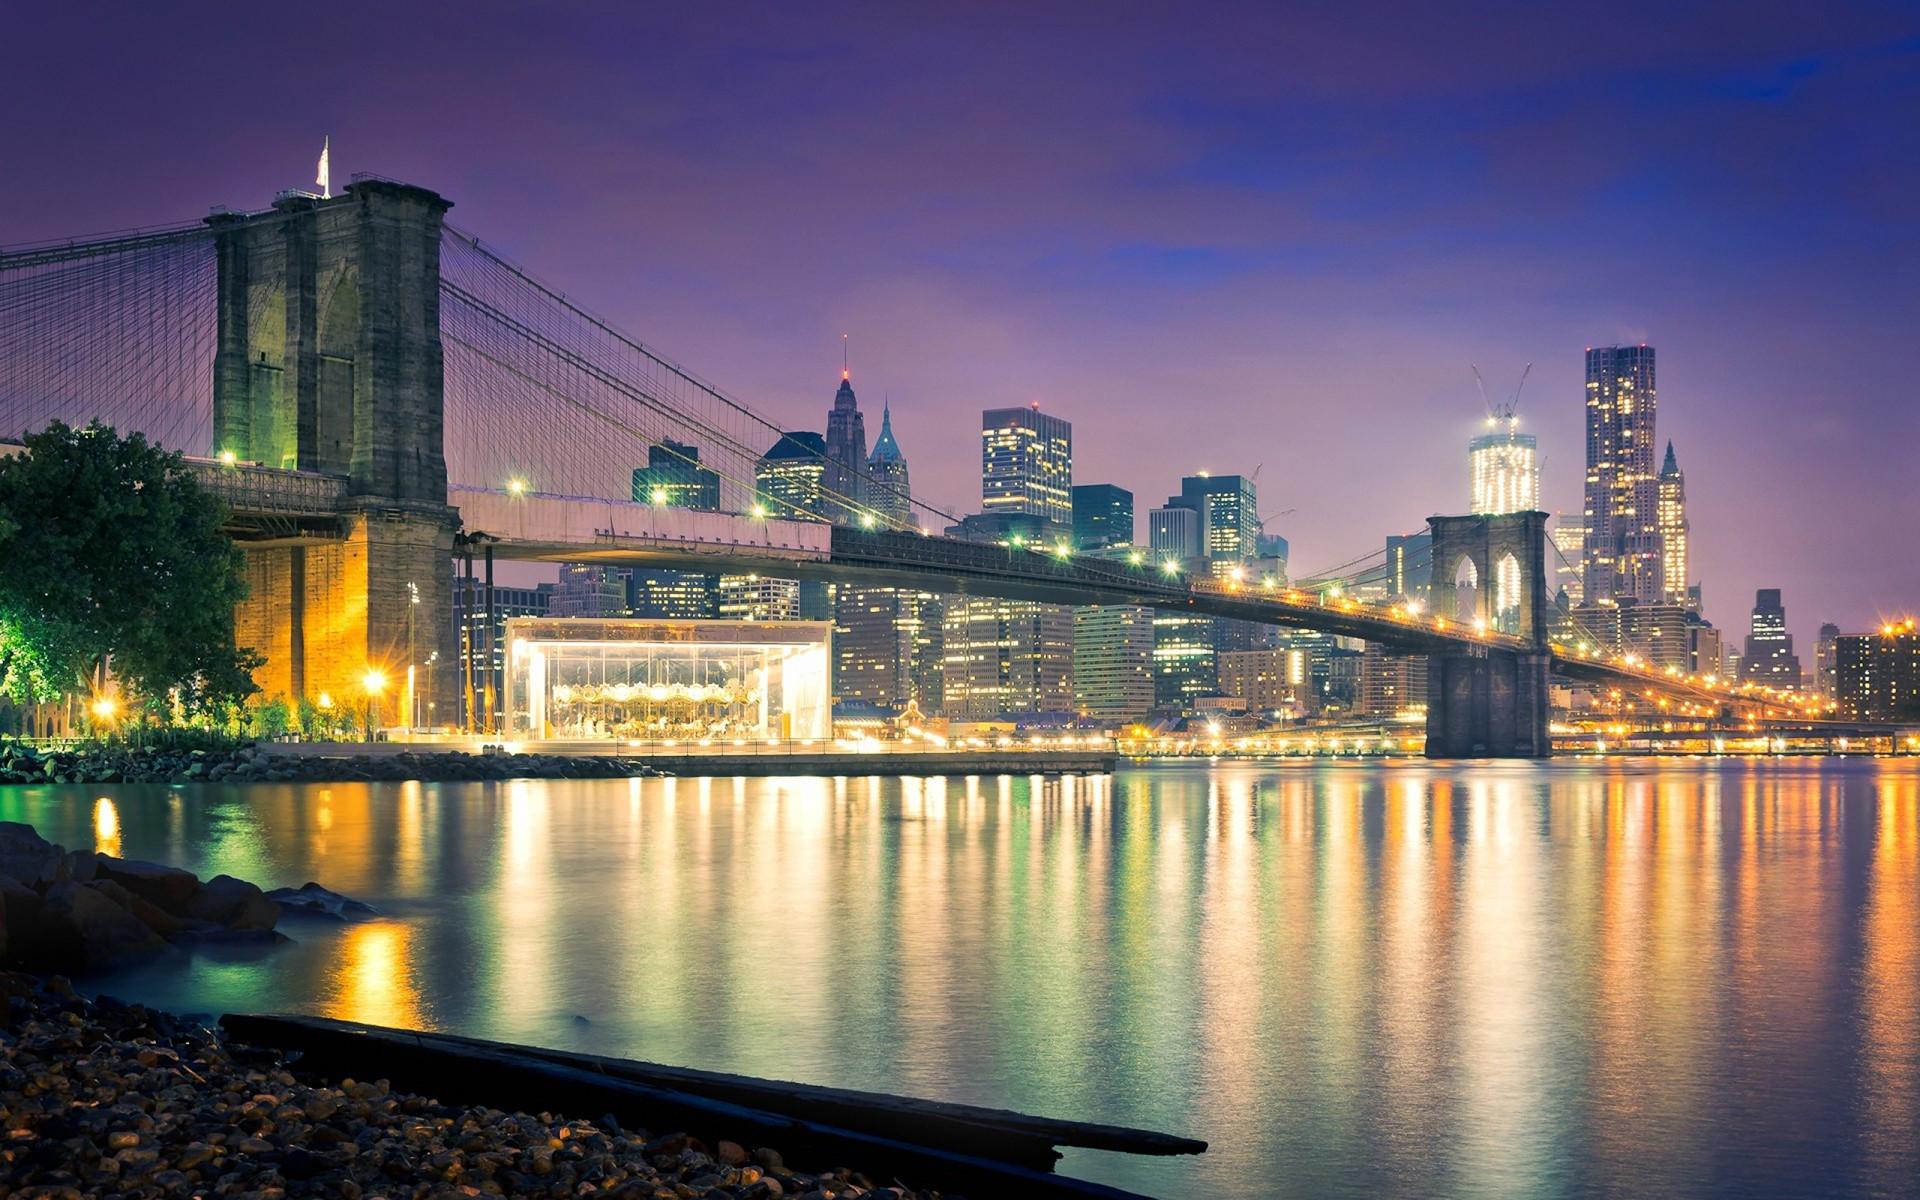 Res: 1920x1200, Brooklyn Bridge Bridge New York Buildings Skyscrapers Ocean Night reflection